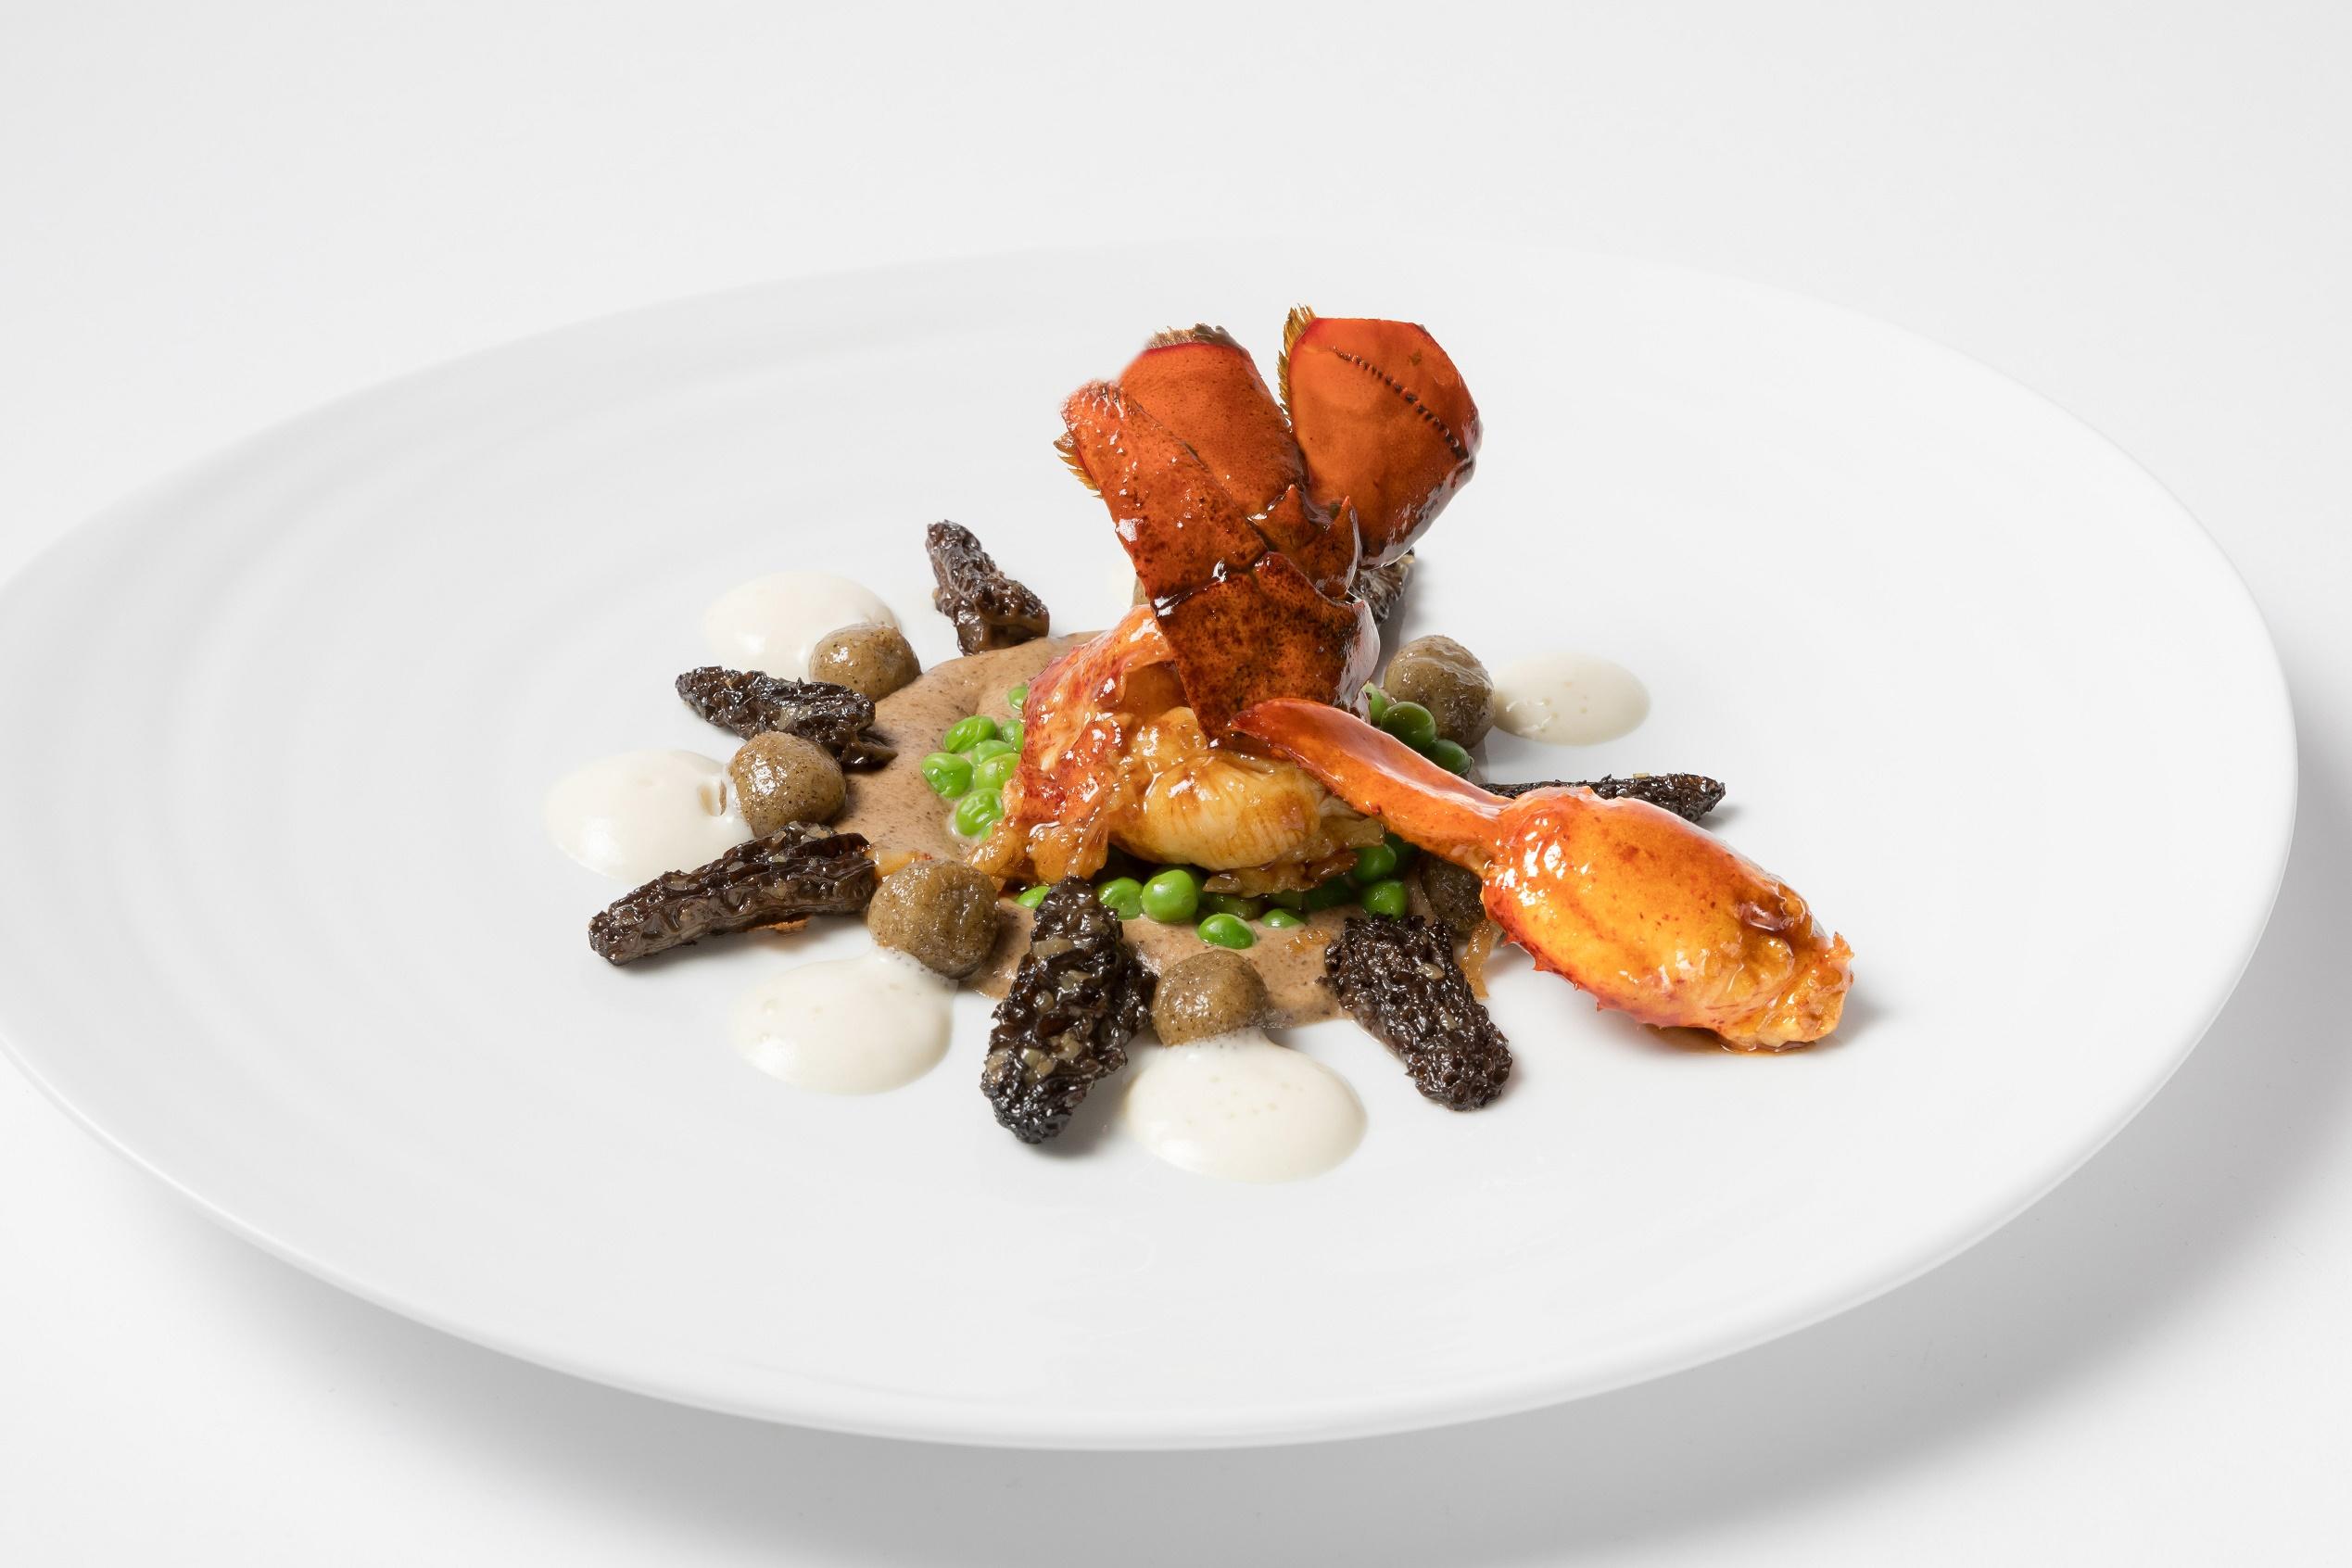 Michelin Star Chef Jean-Michel Lorain to Present 25th Anniversary of His Lobster Menu at J'AIME ...